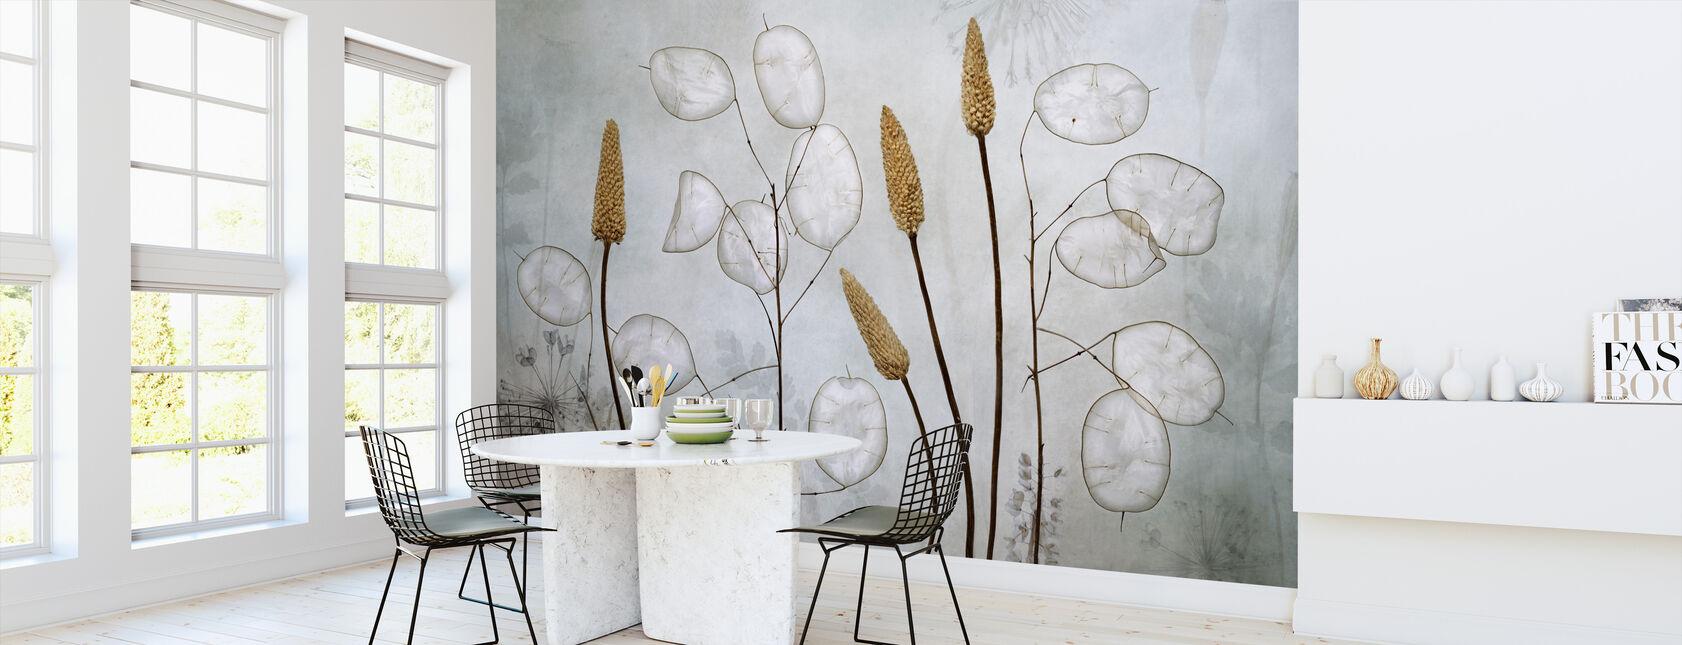 Lunaria - Behang - Keuken